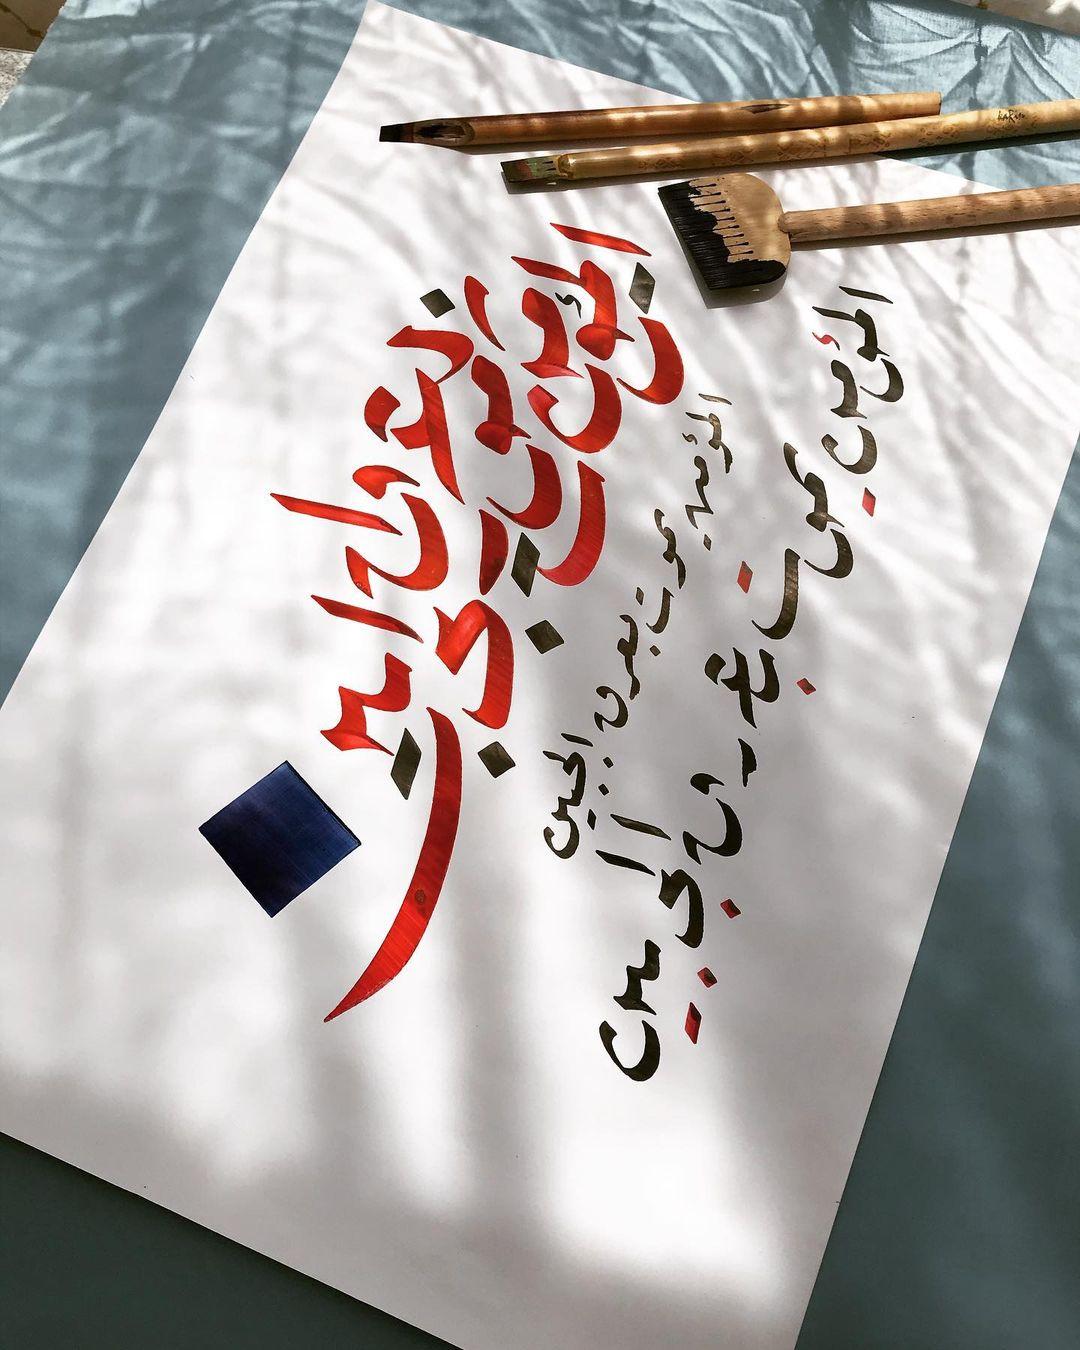 Donwload Photo المؤمن يموت بعرق الجبين #typografi #lettering #hüsnihat #kaligrafi #فن #فنون #خ...- hattat_aa 3